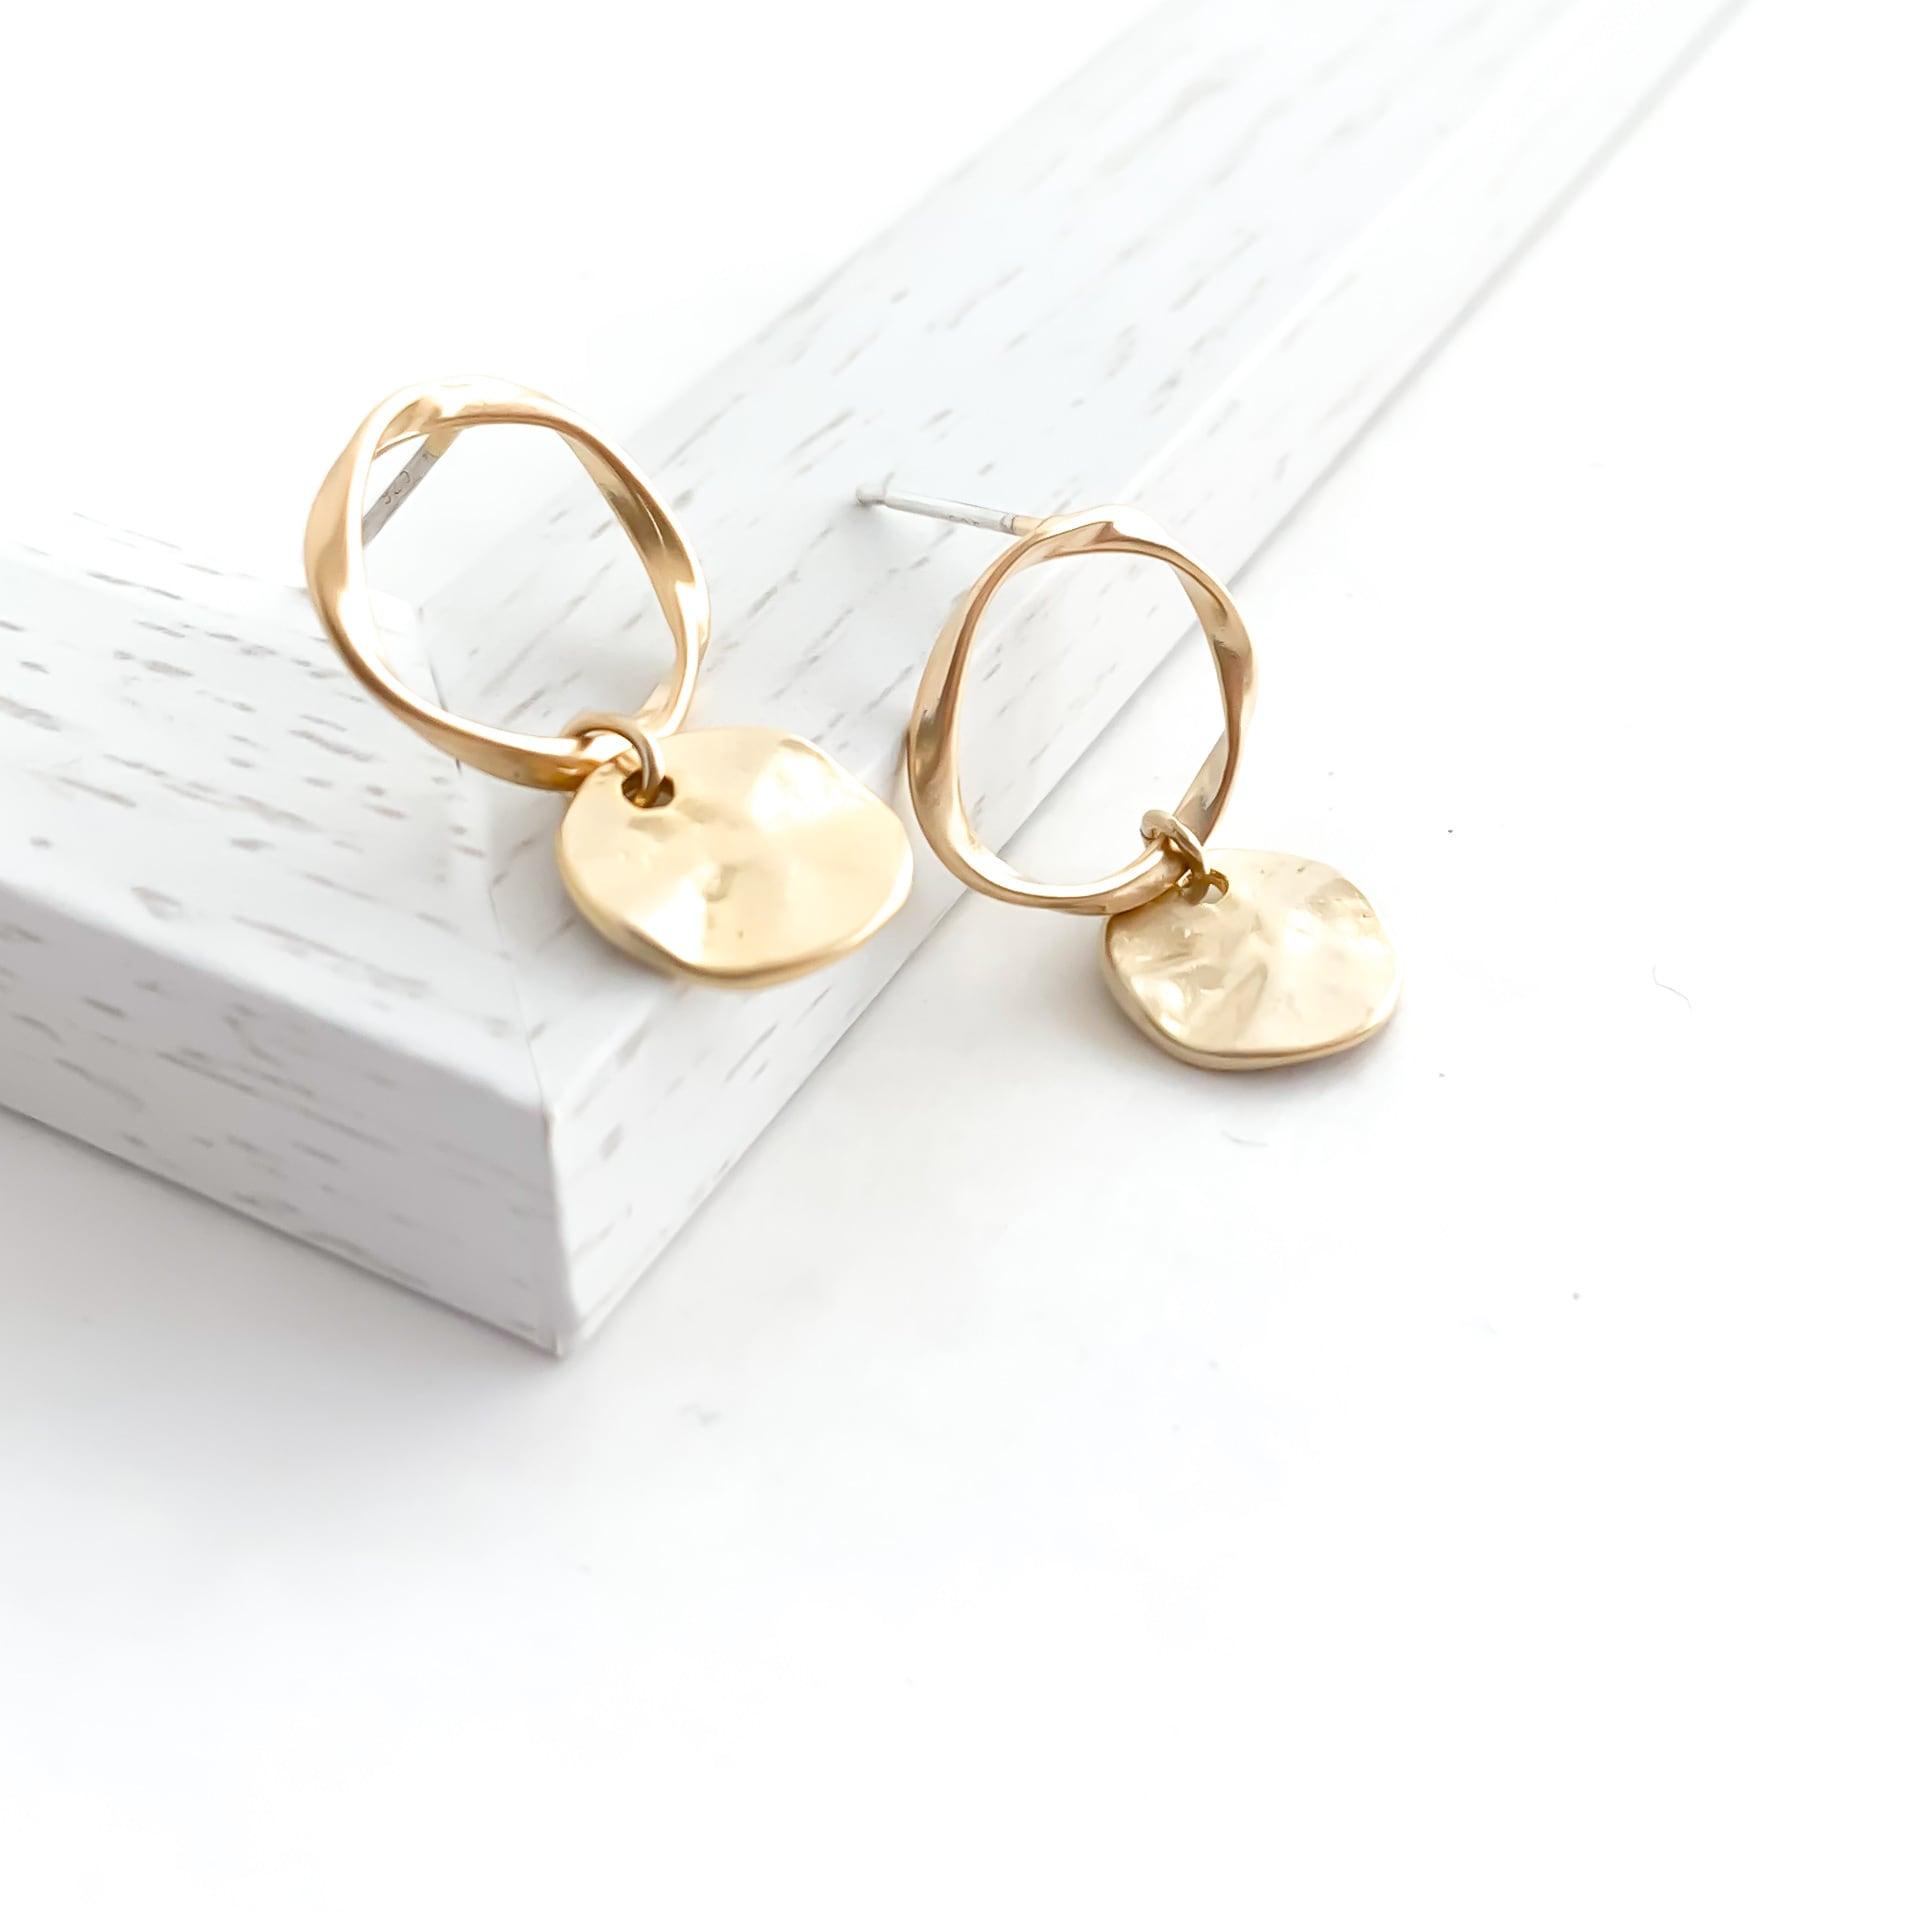 Mobius Strip Pierce(gold)/earring